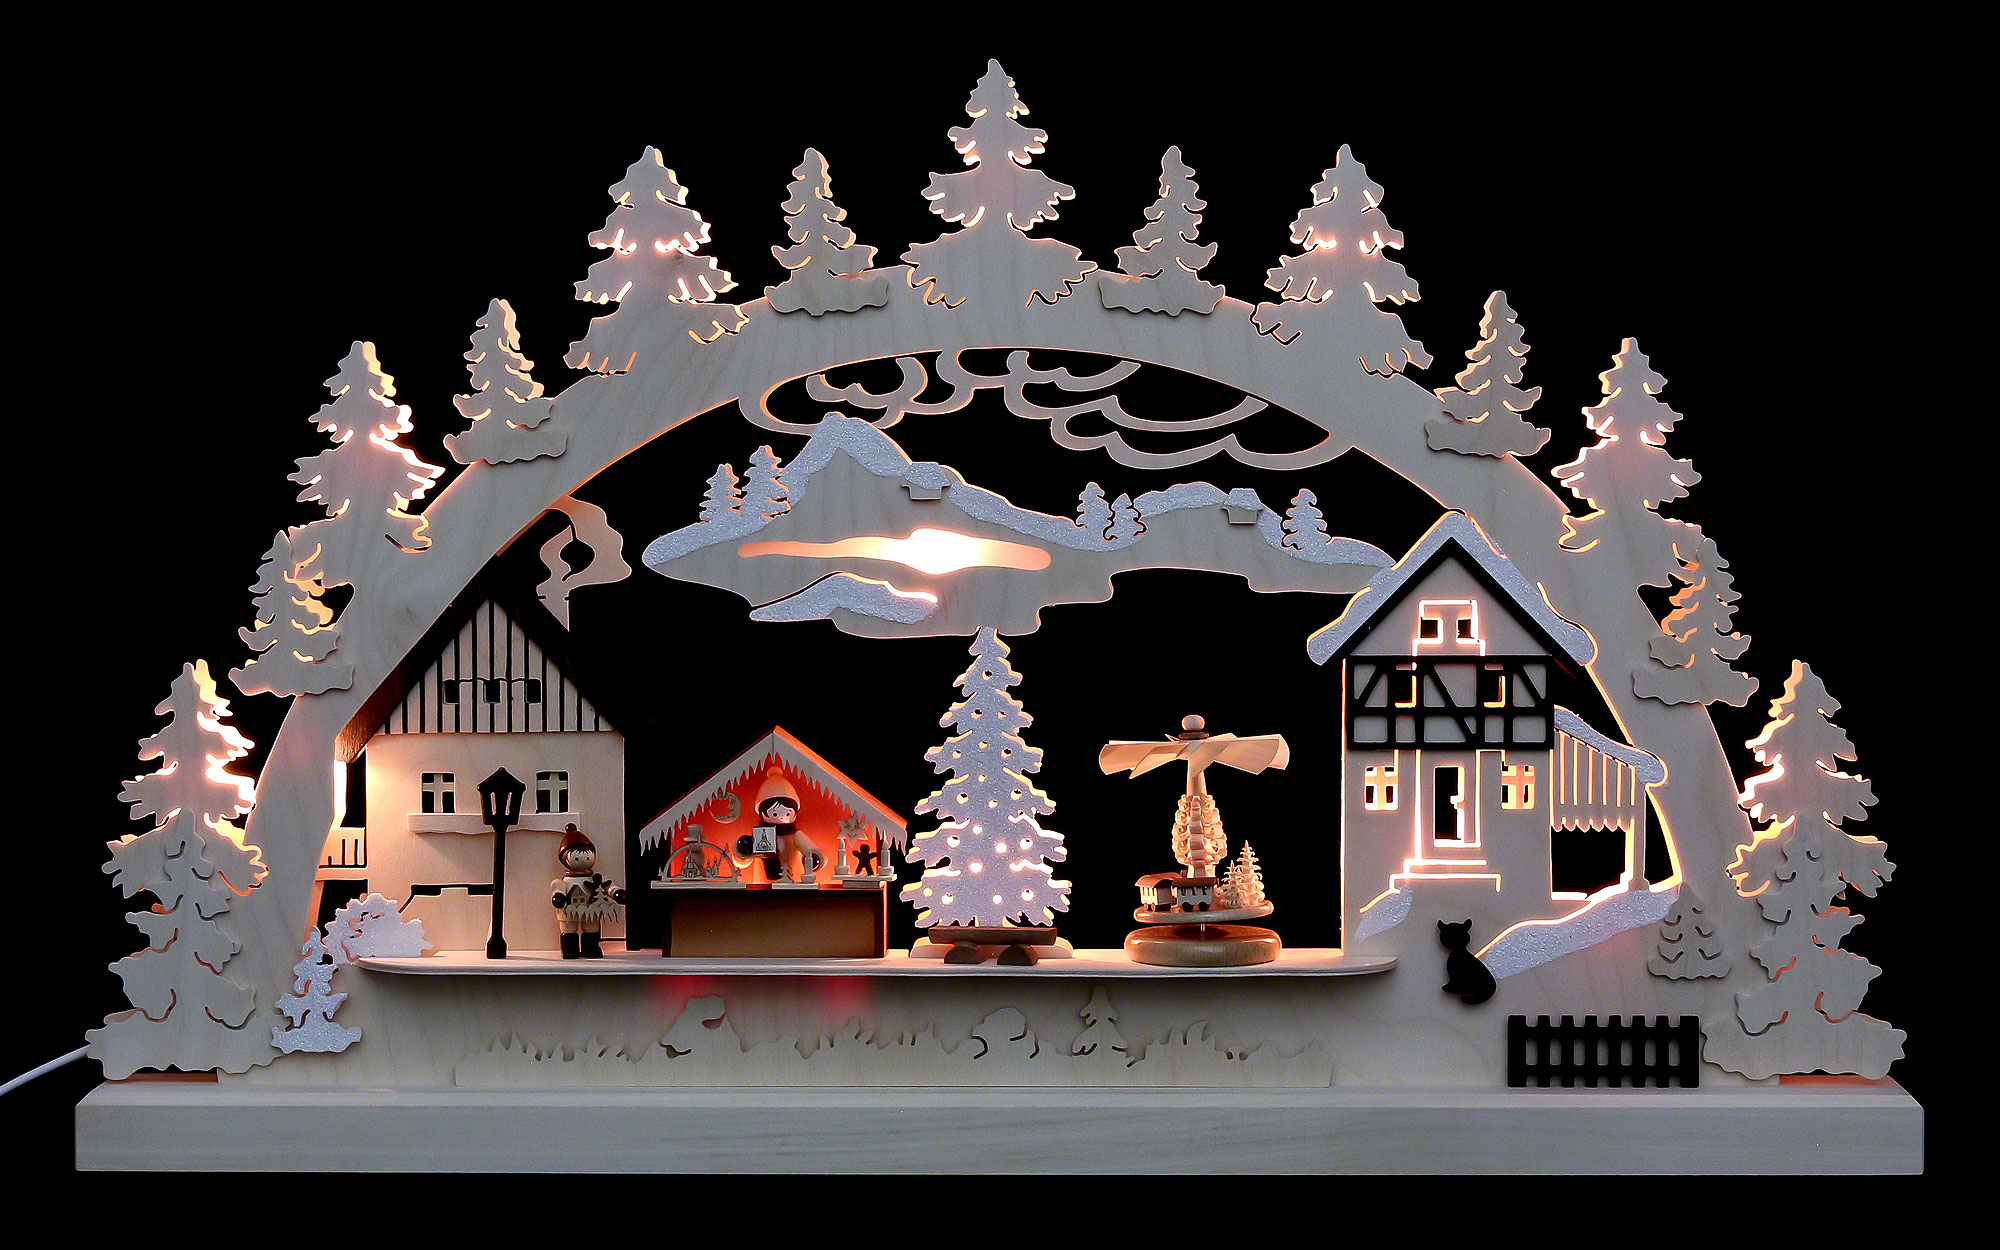 Christmas Village.Candle Arch Christmas Village 62x37x5 5 Cm 24x14x2 Inch